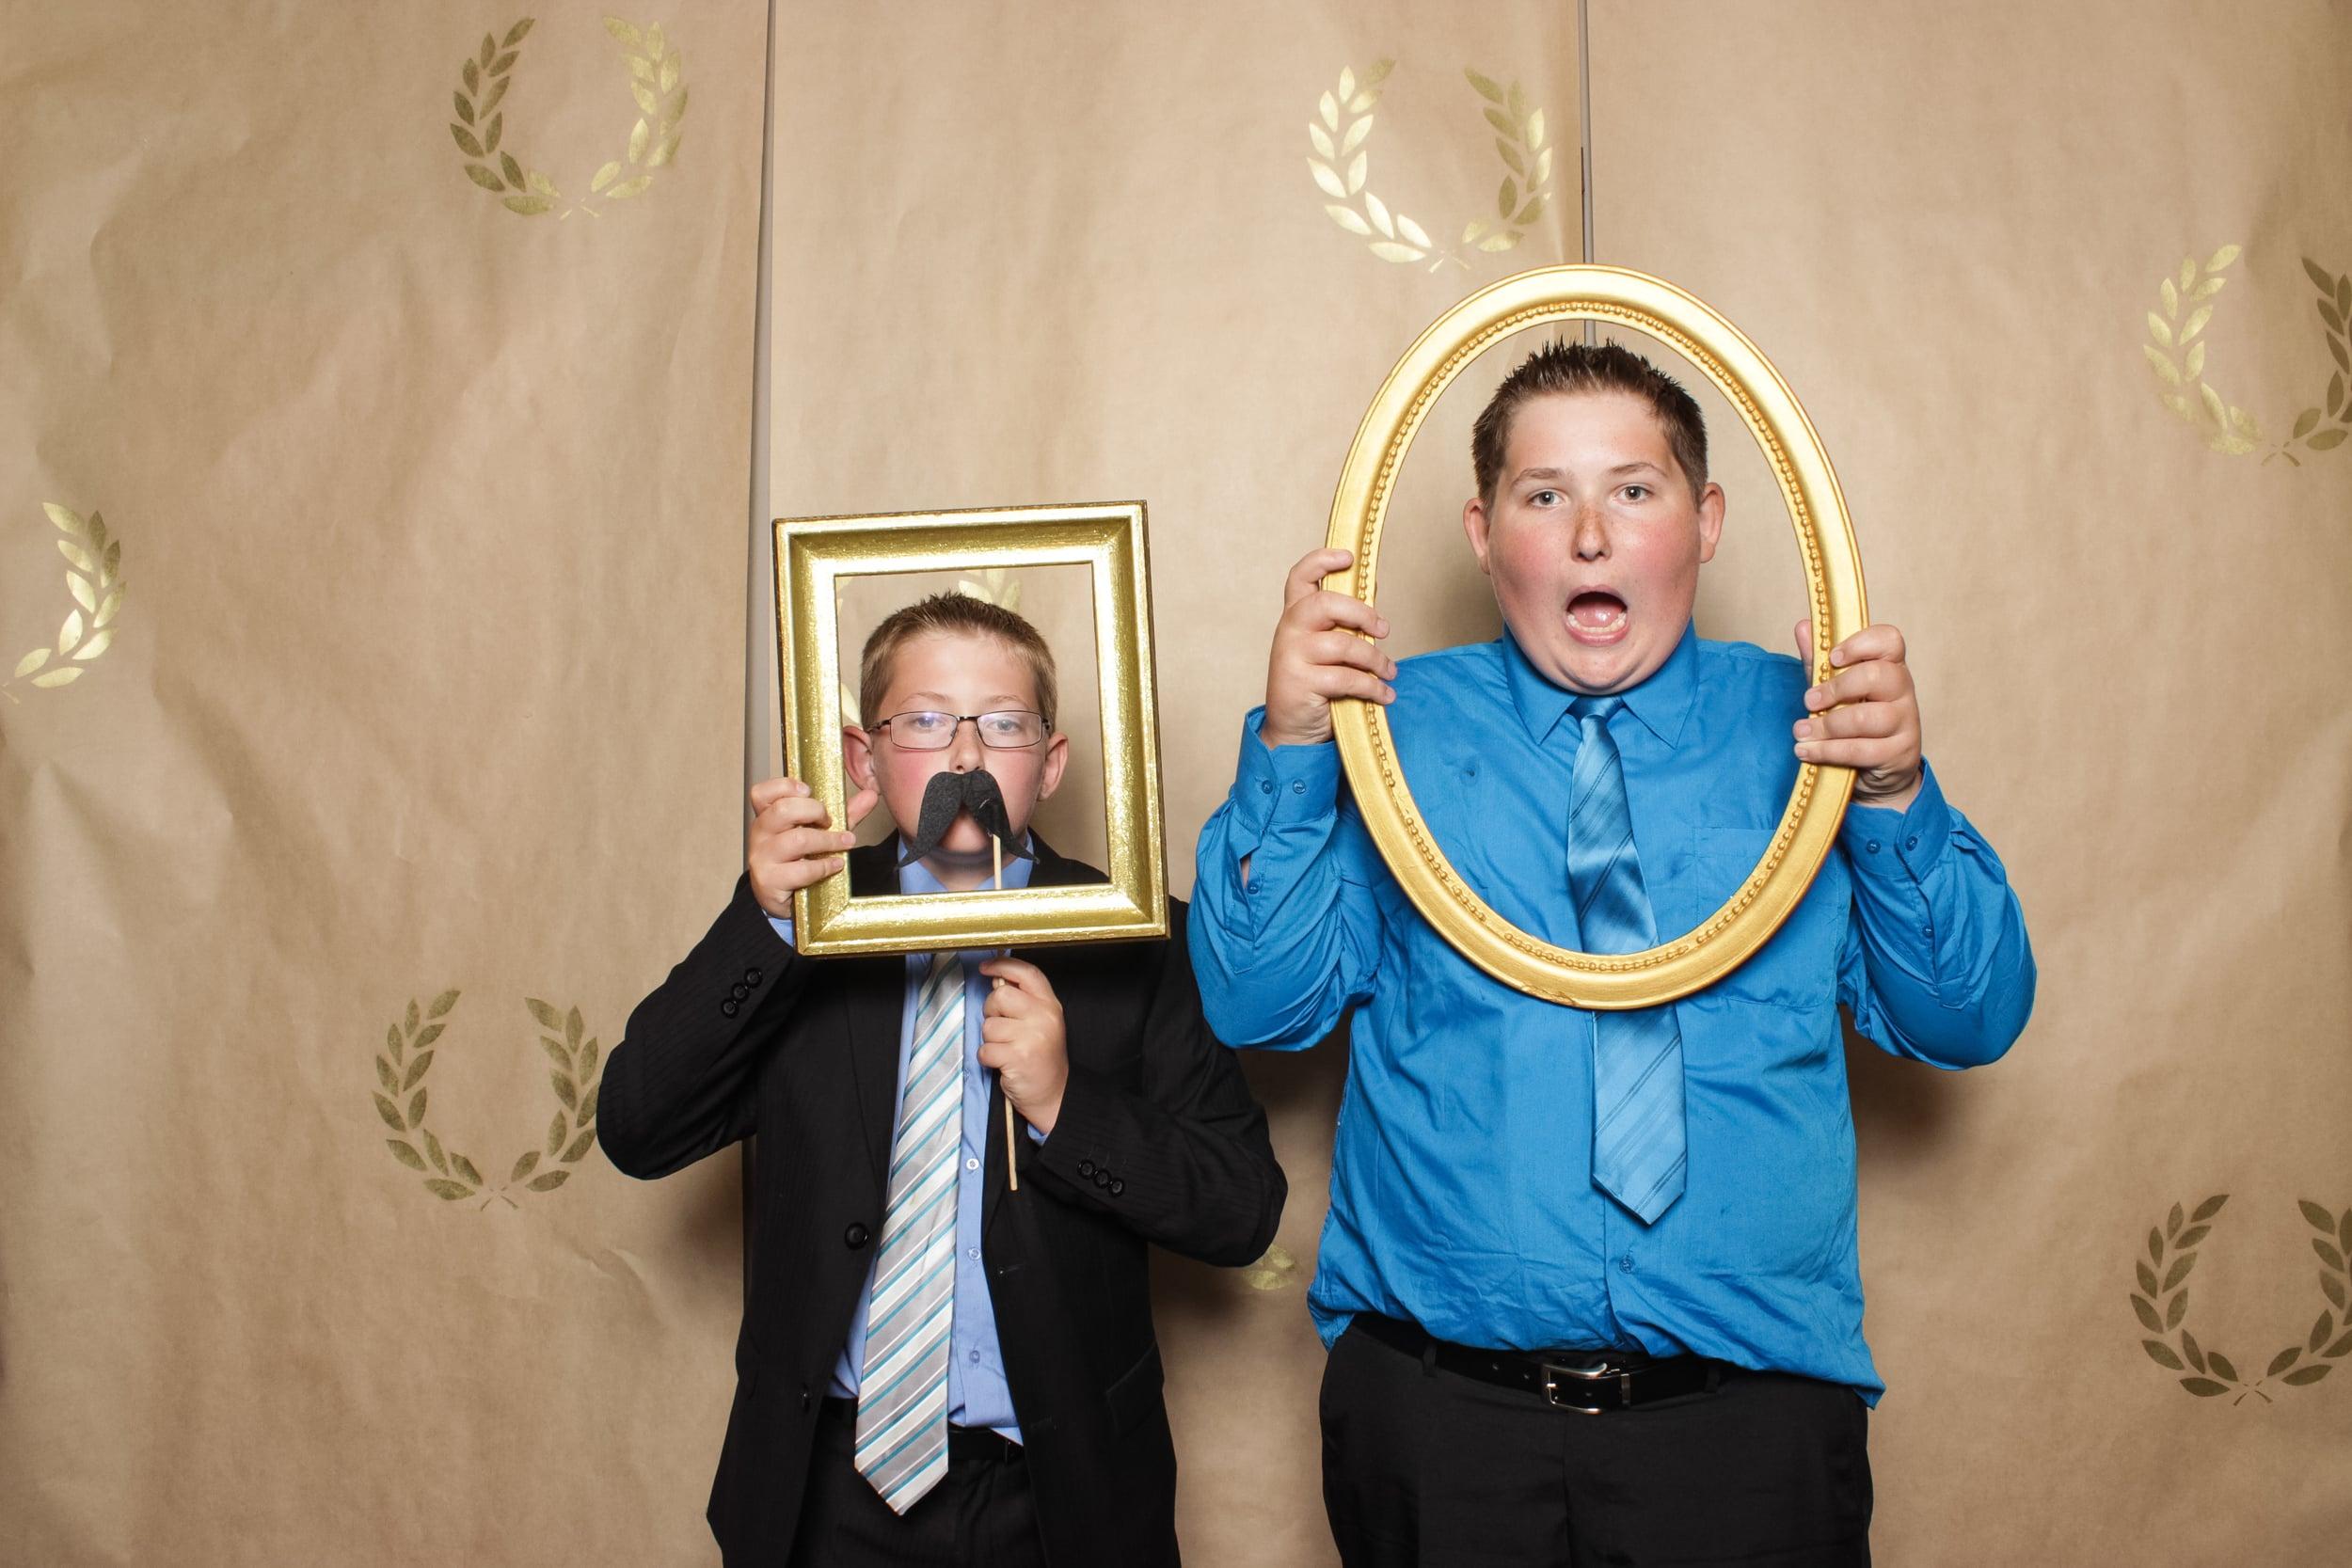 ottawa-wedding-photobooth-50.JPG